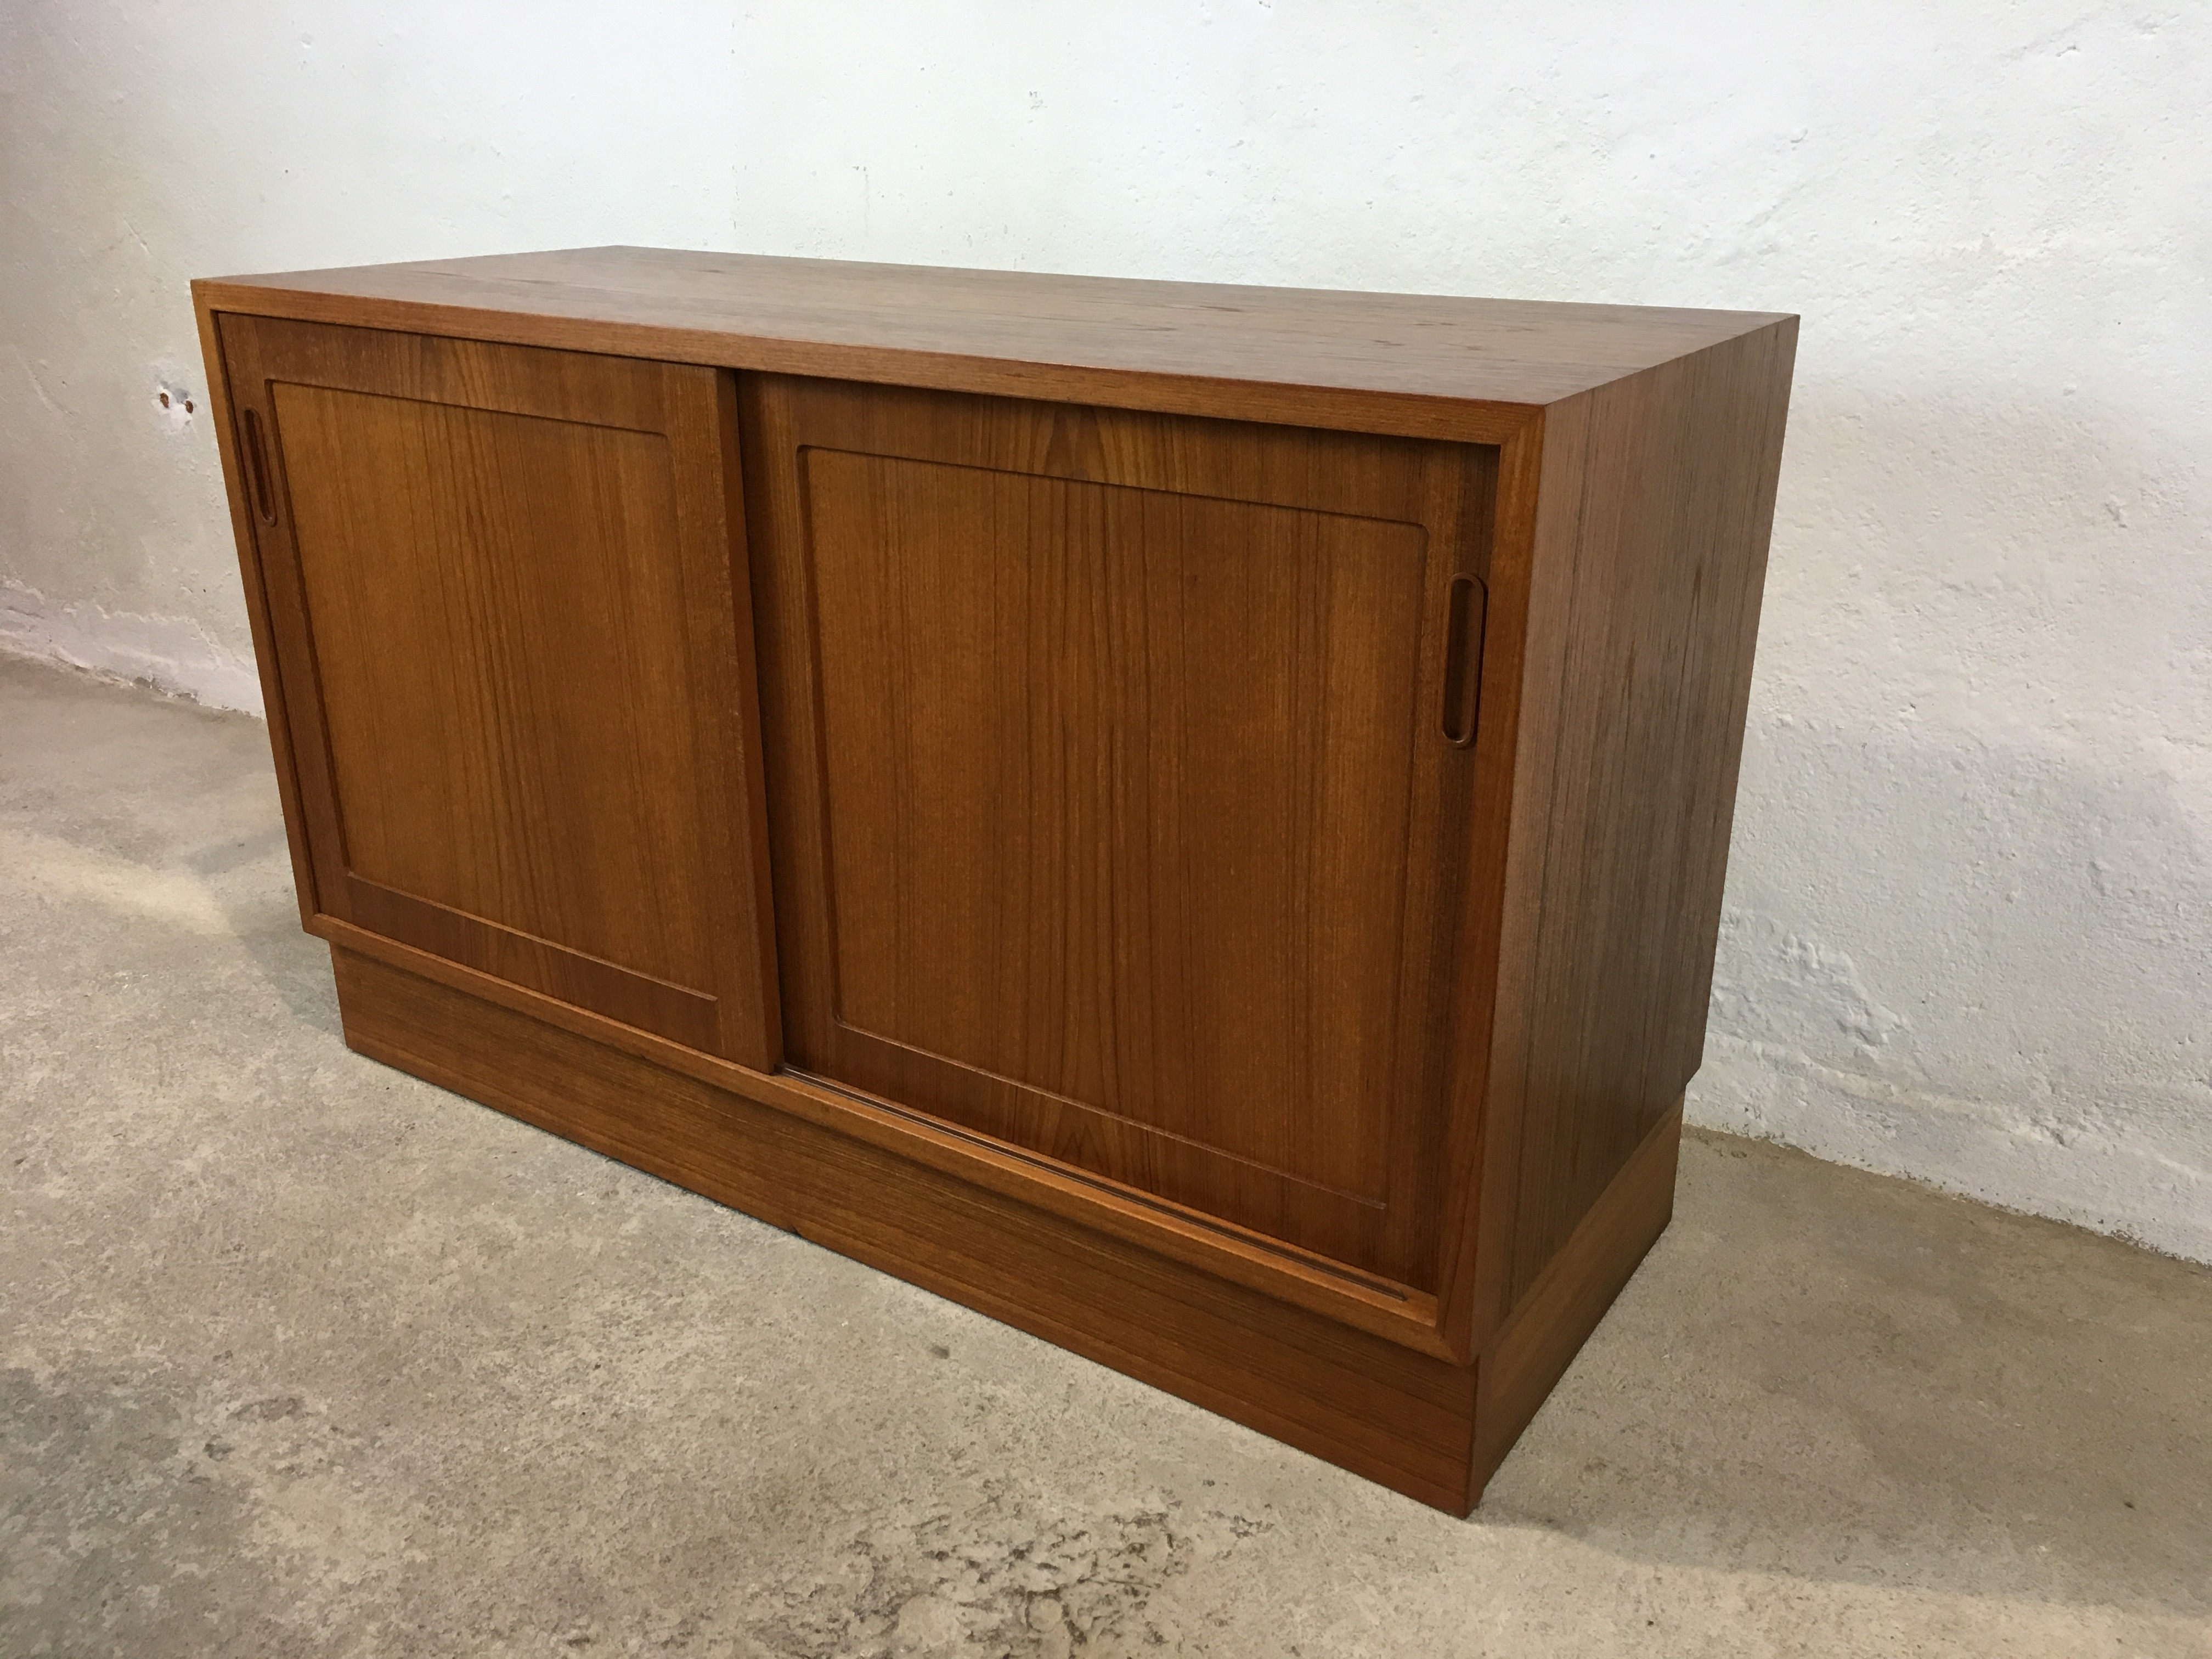 buffet scandinave ann e 60 vintage cabinet teck danish. Black Bedroom Furniture Sets. Home Design Ideas